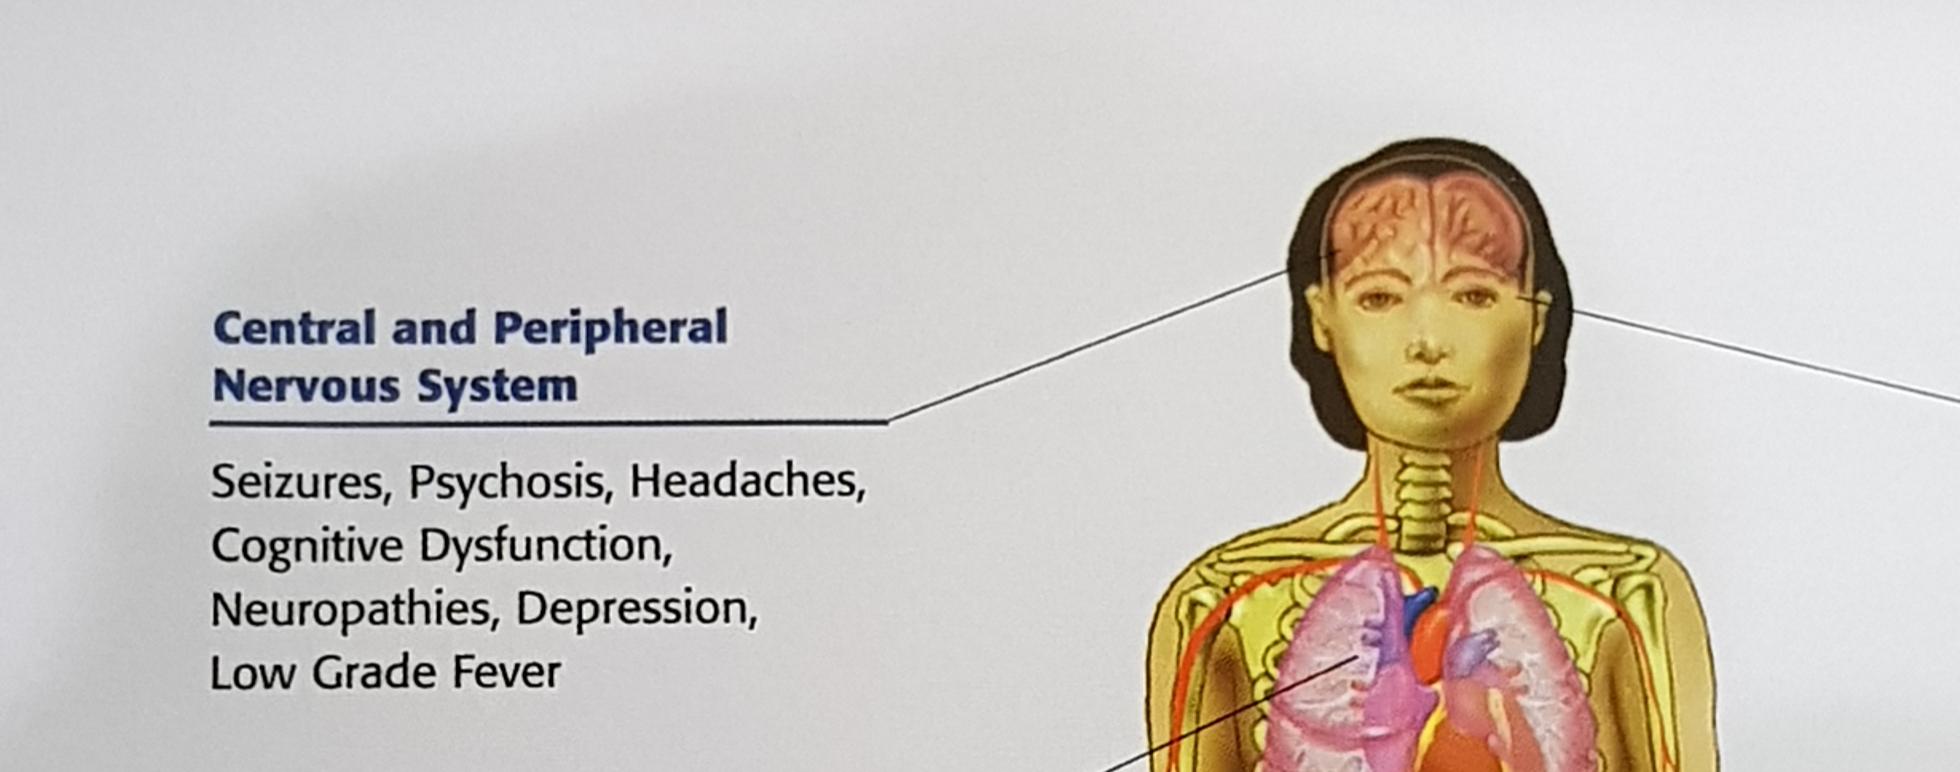 www.DokterRematikAutoimun.com - Brain Fog pada Penderita Lupus